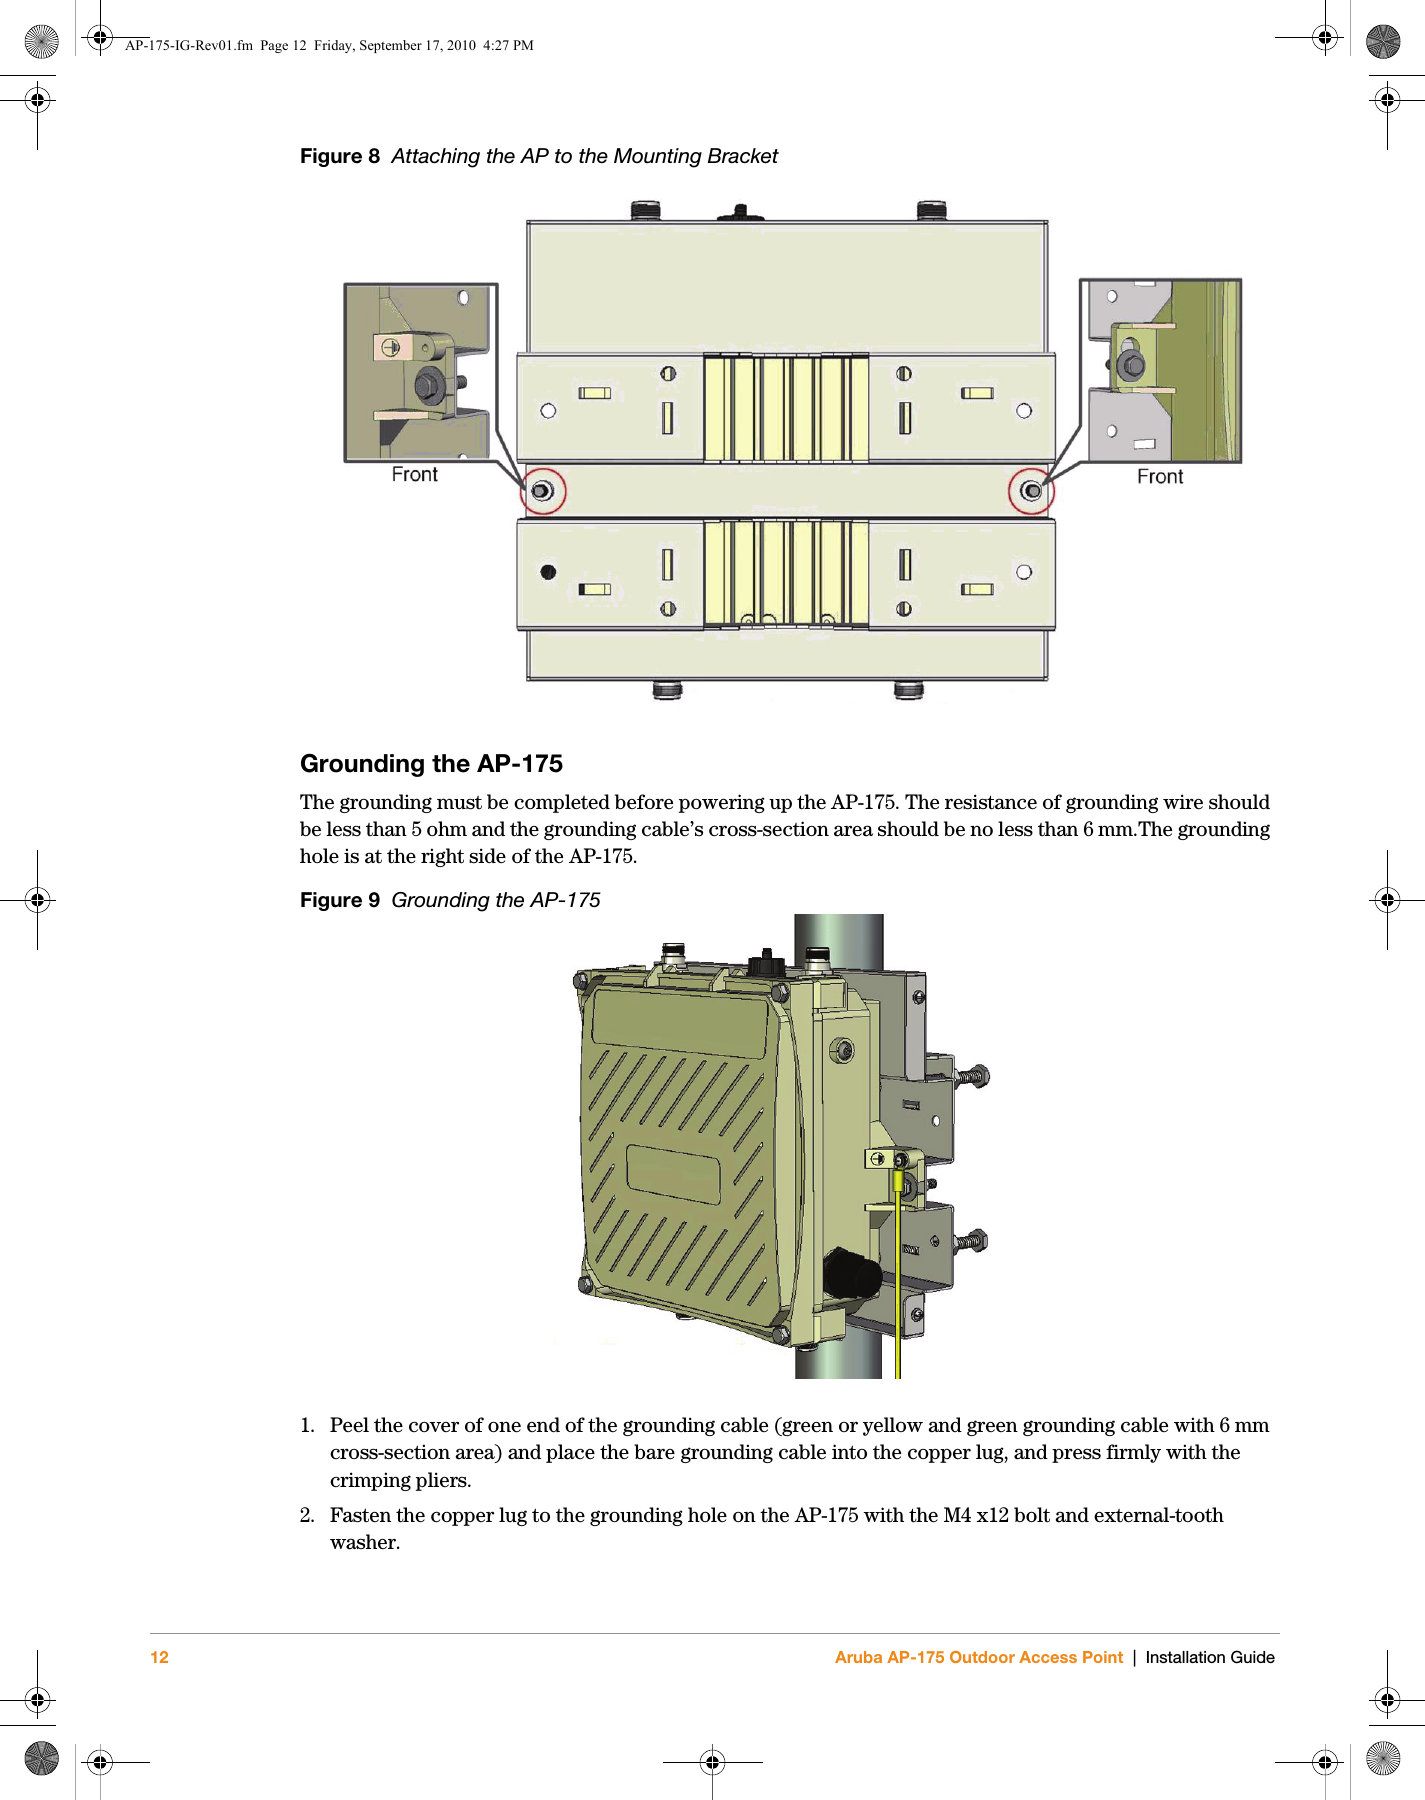 Hewlett Packard Enterprise Ap175 80211 A B G N Wireless Access Wiring Diagram 12 Aruba Ap 175 Outdoor Point Installation Guidefigure 8 Attaching The To